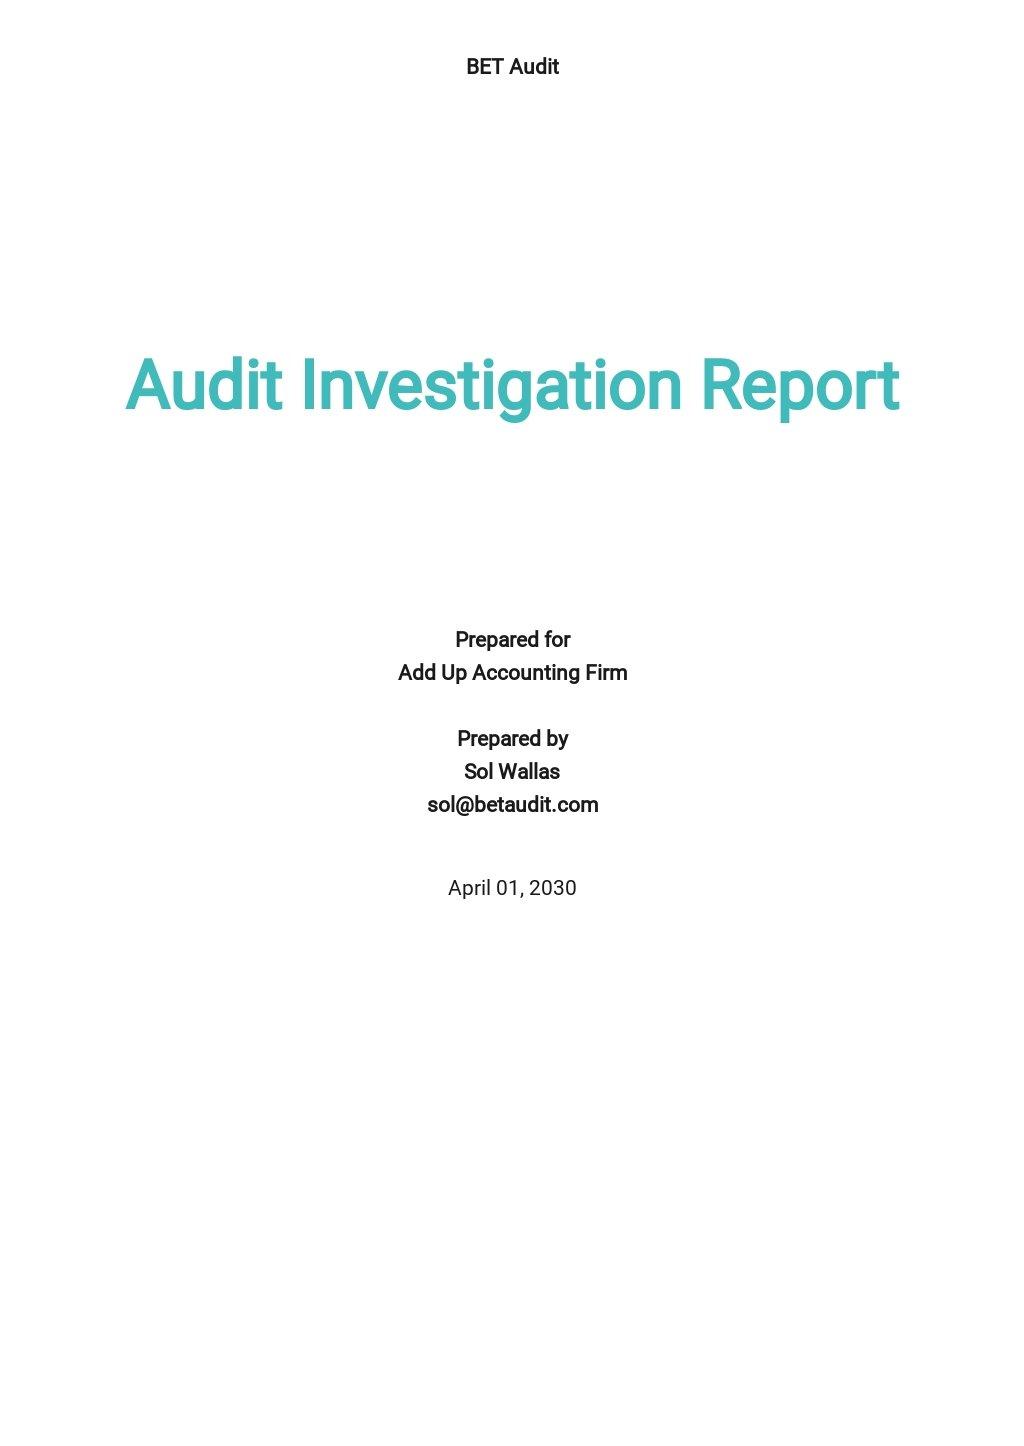 Audit Investigation Report Template.jpe